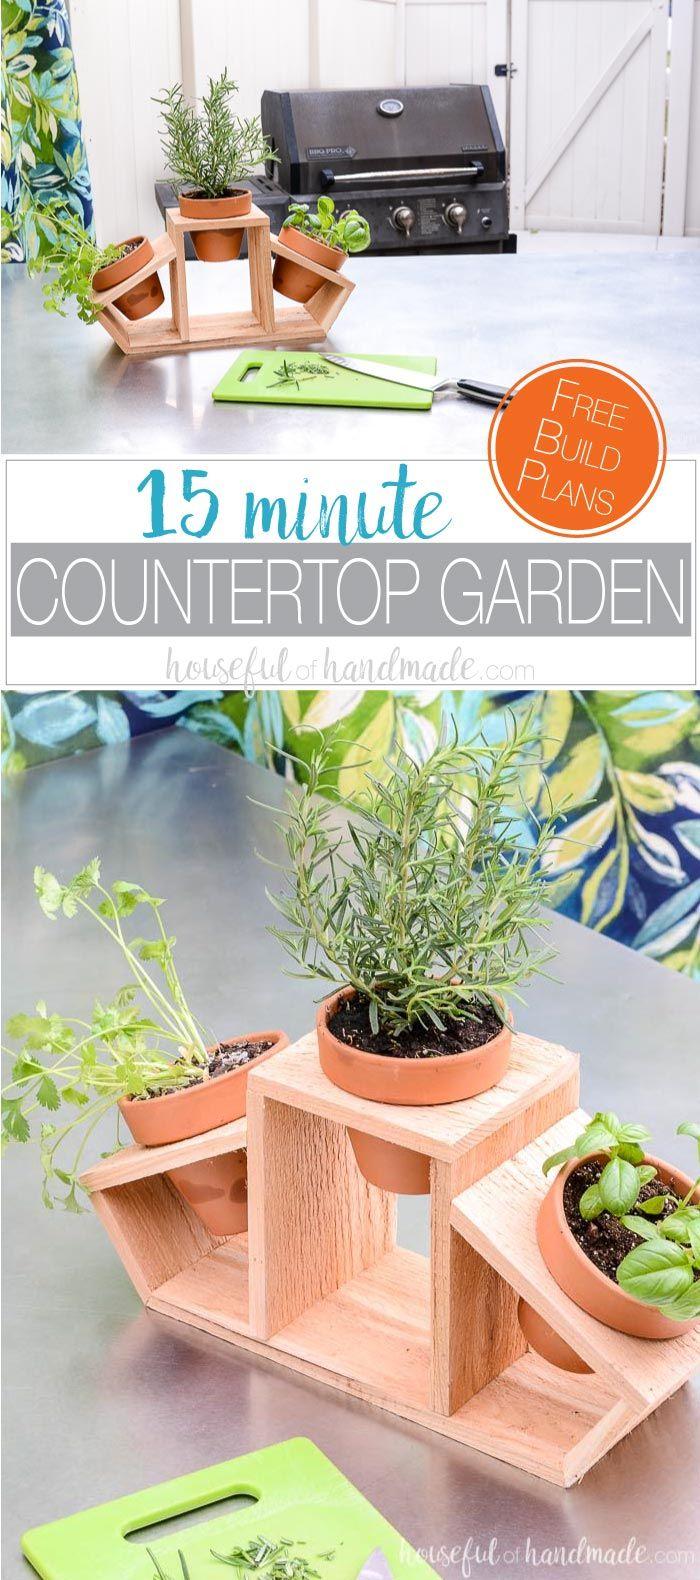 15 Minute Countertop Herb Garden Creative Diy Projects 400 x 300